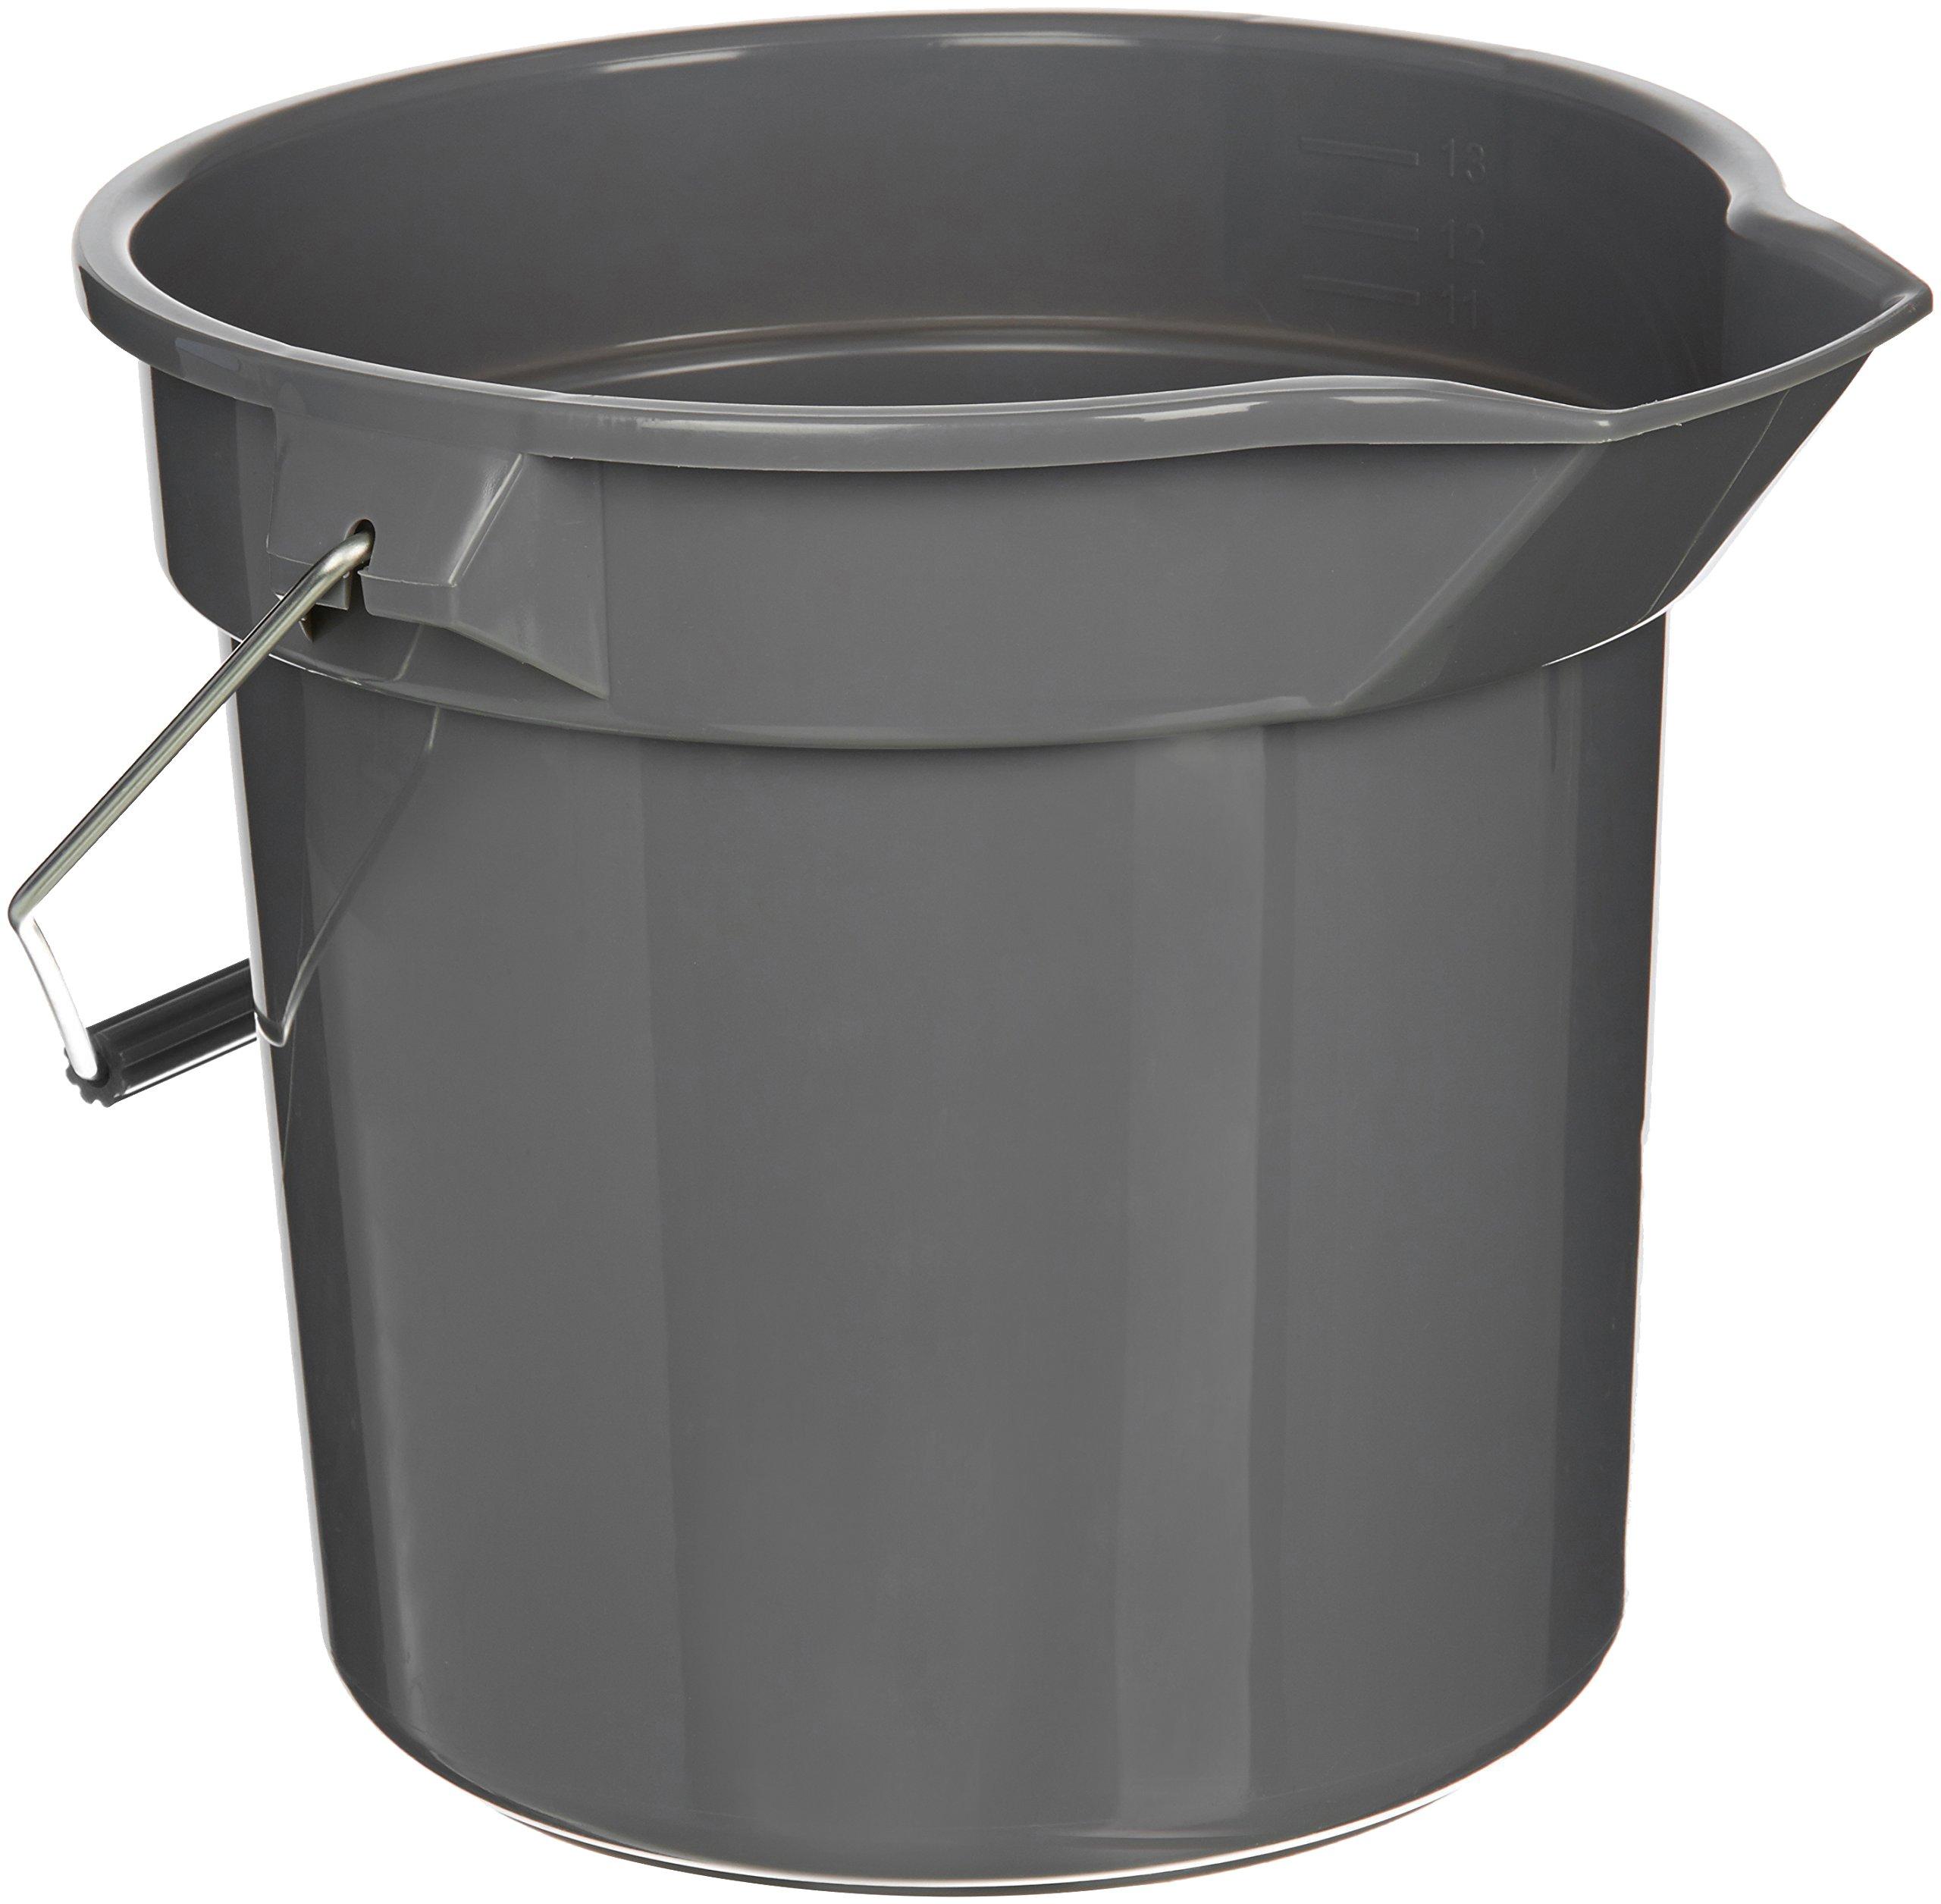 AmazonBasics 14 Quart Plastic Cleaning Bucket, Grey - 6-Pack